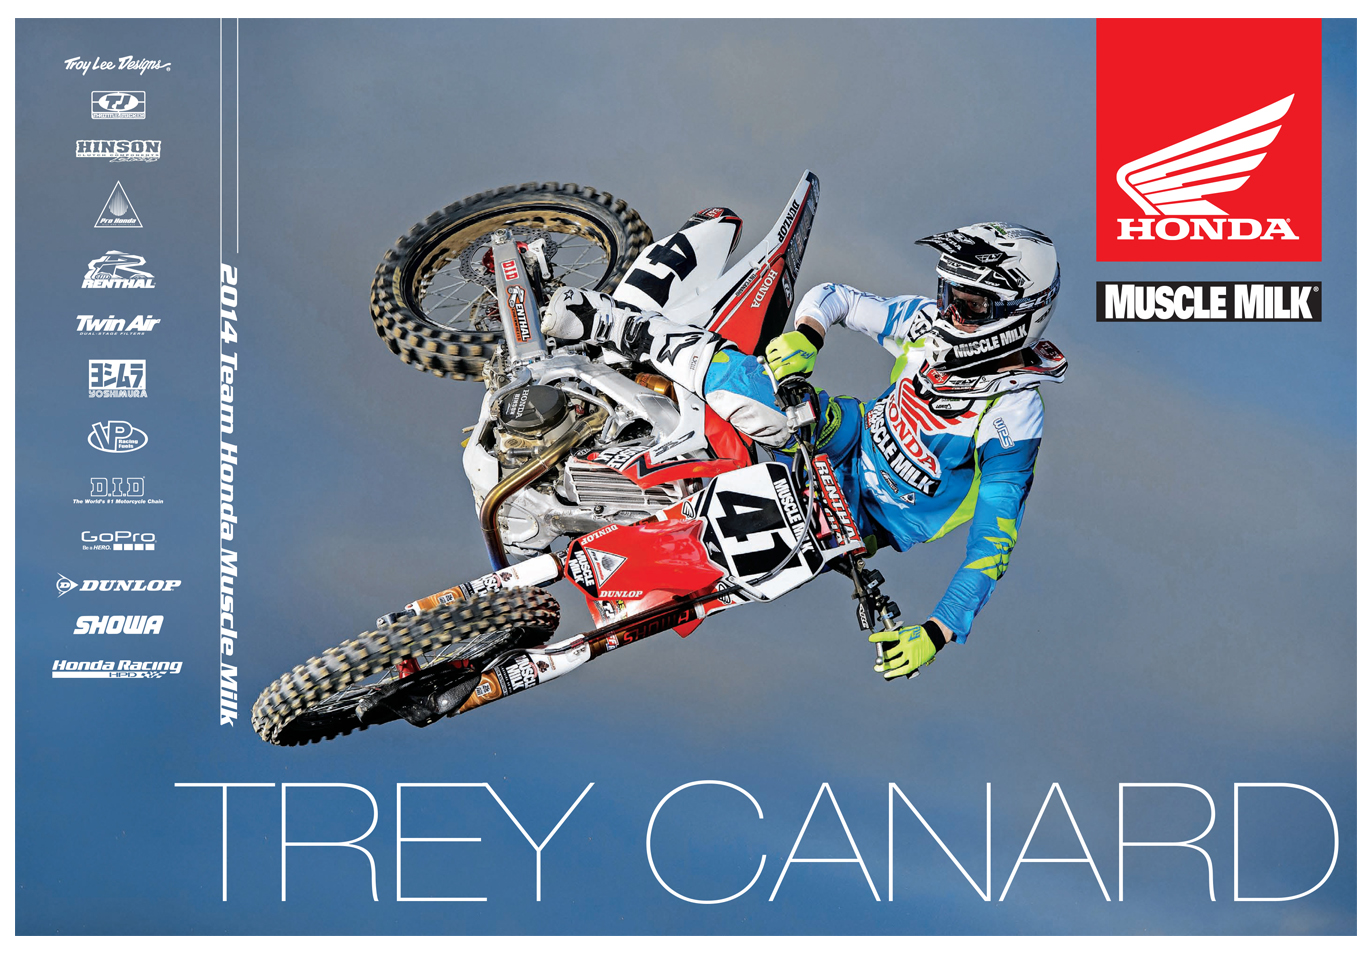 TC_Poster.jpg